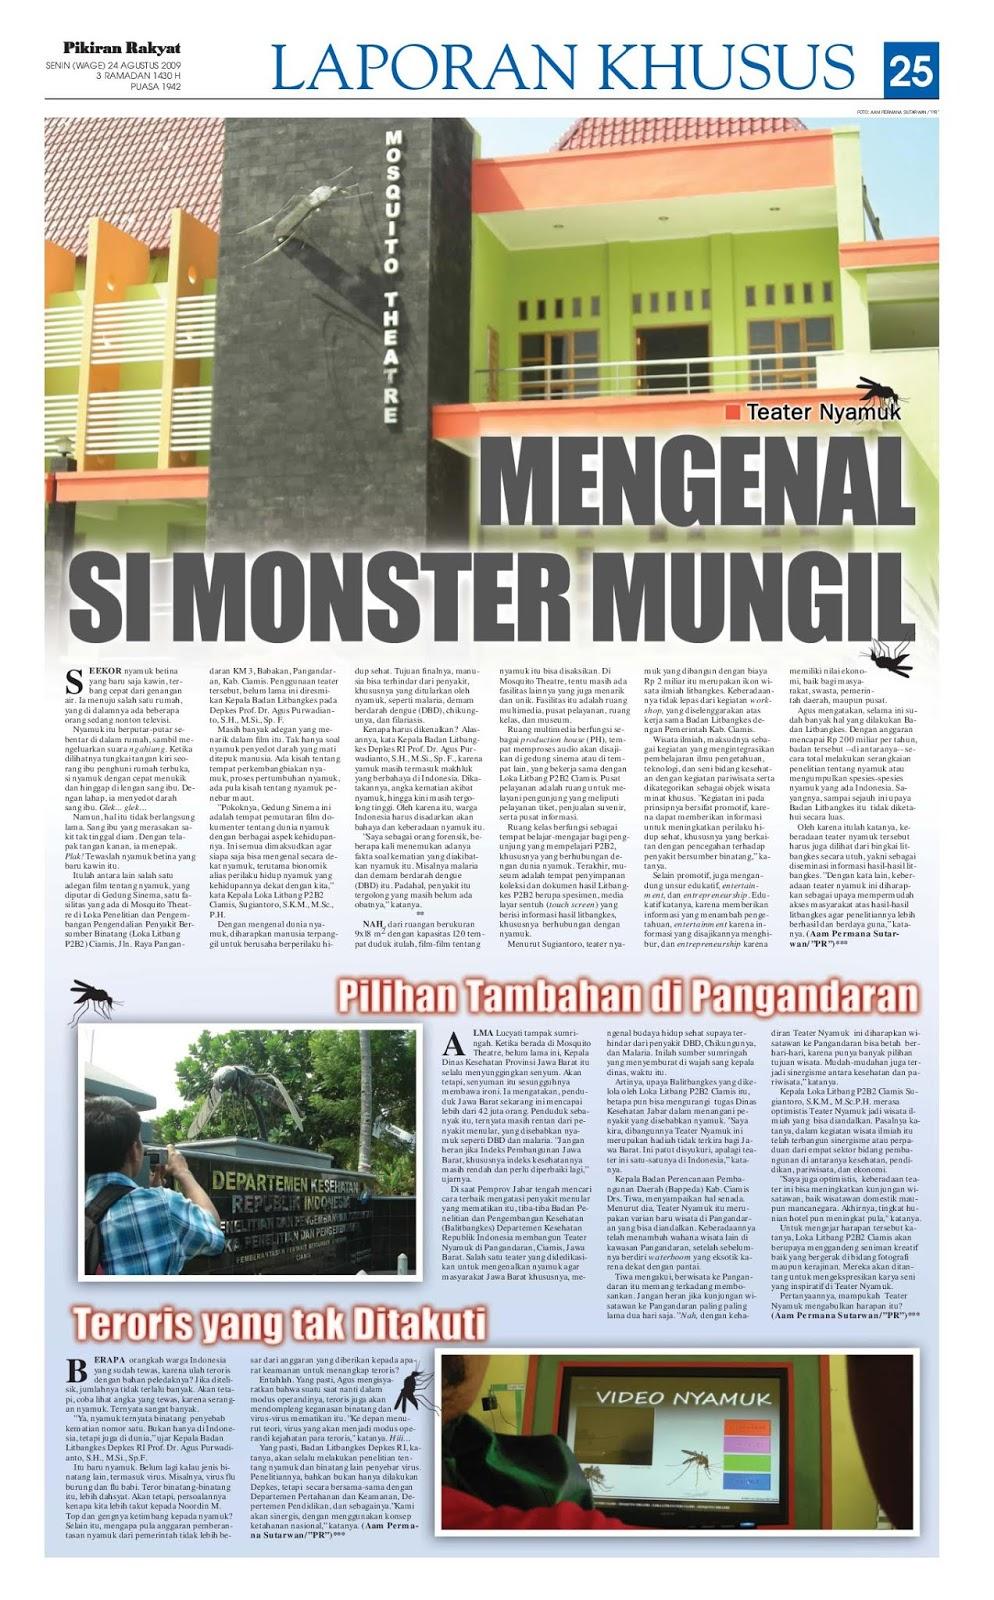 Teater Nyamuk: Mengenal Si Monster Mungil